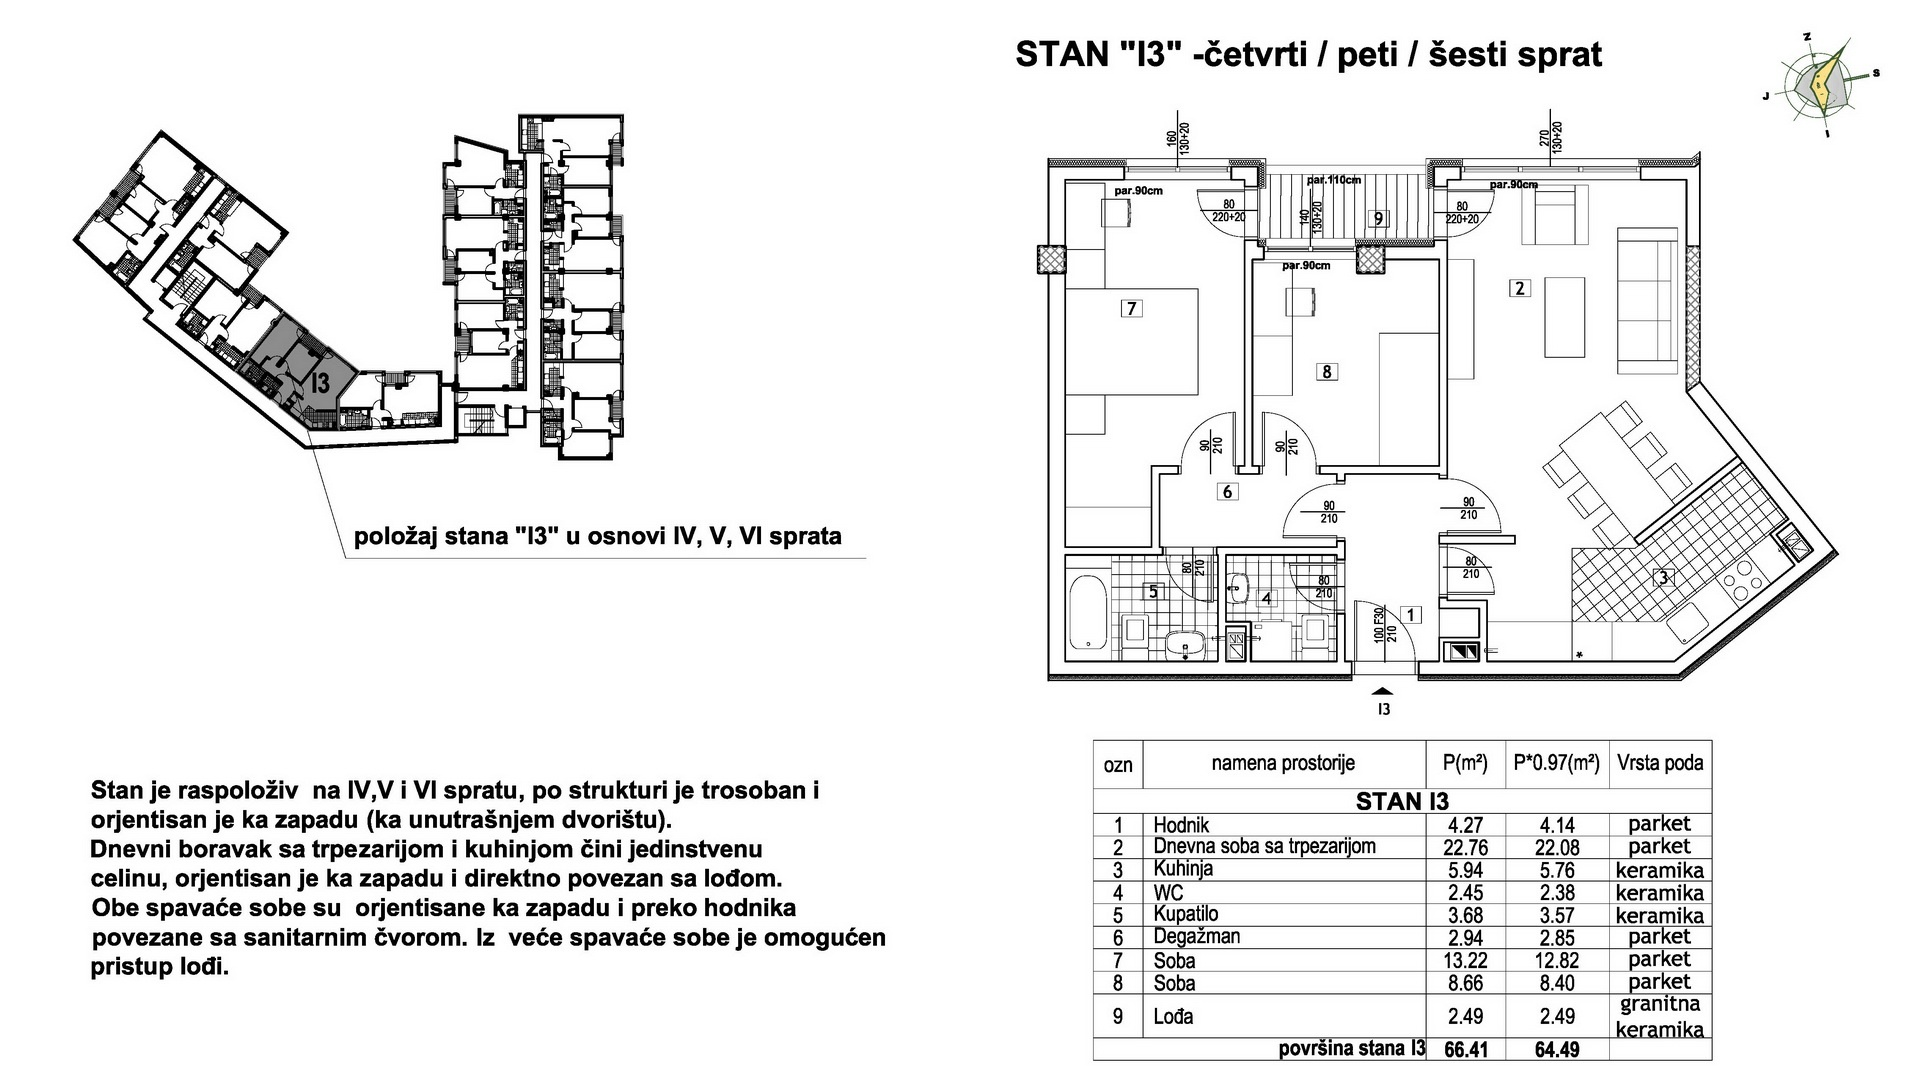 Objekat u Prešernovoj bb - Stan I3